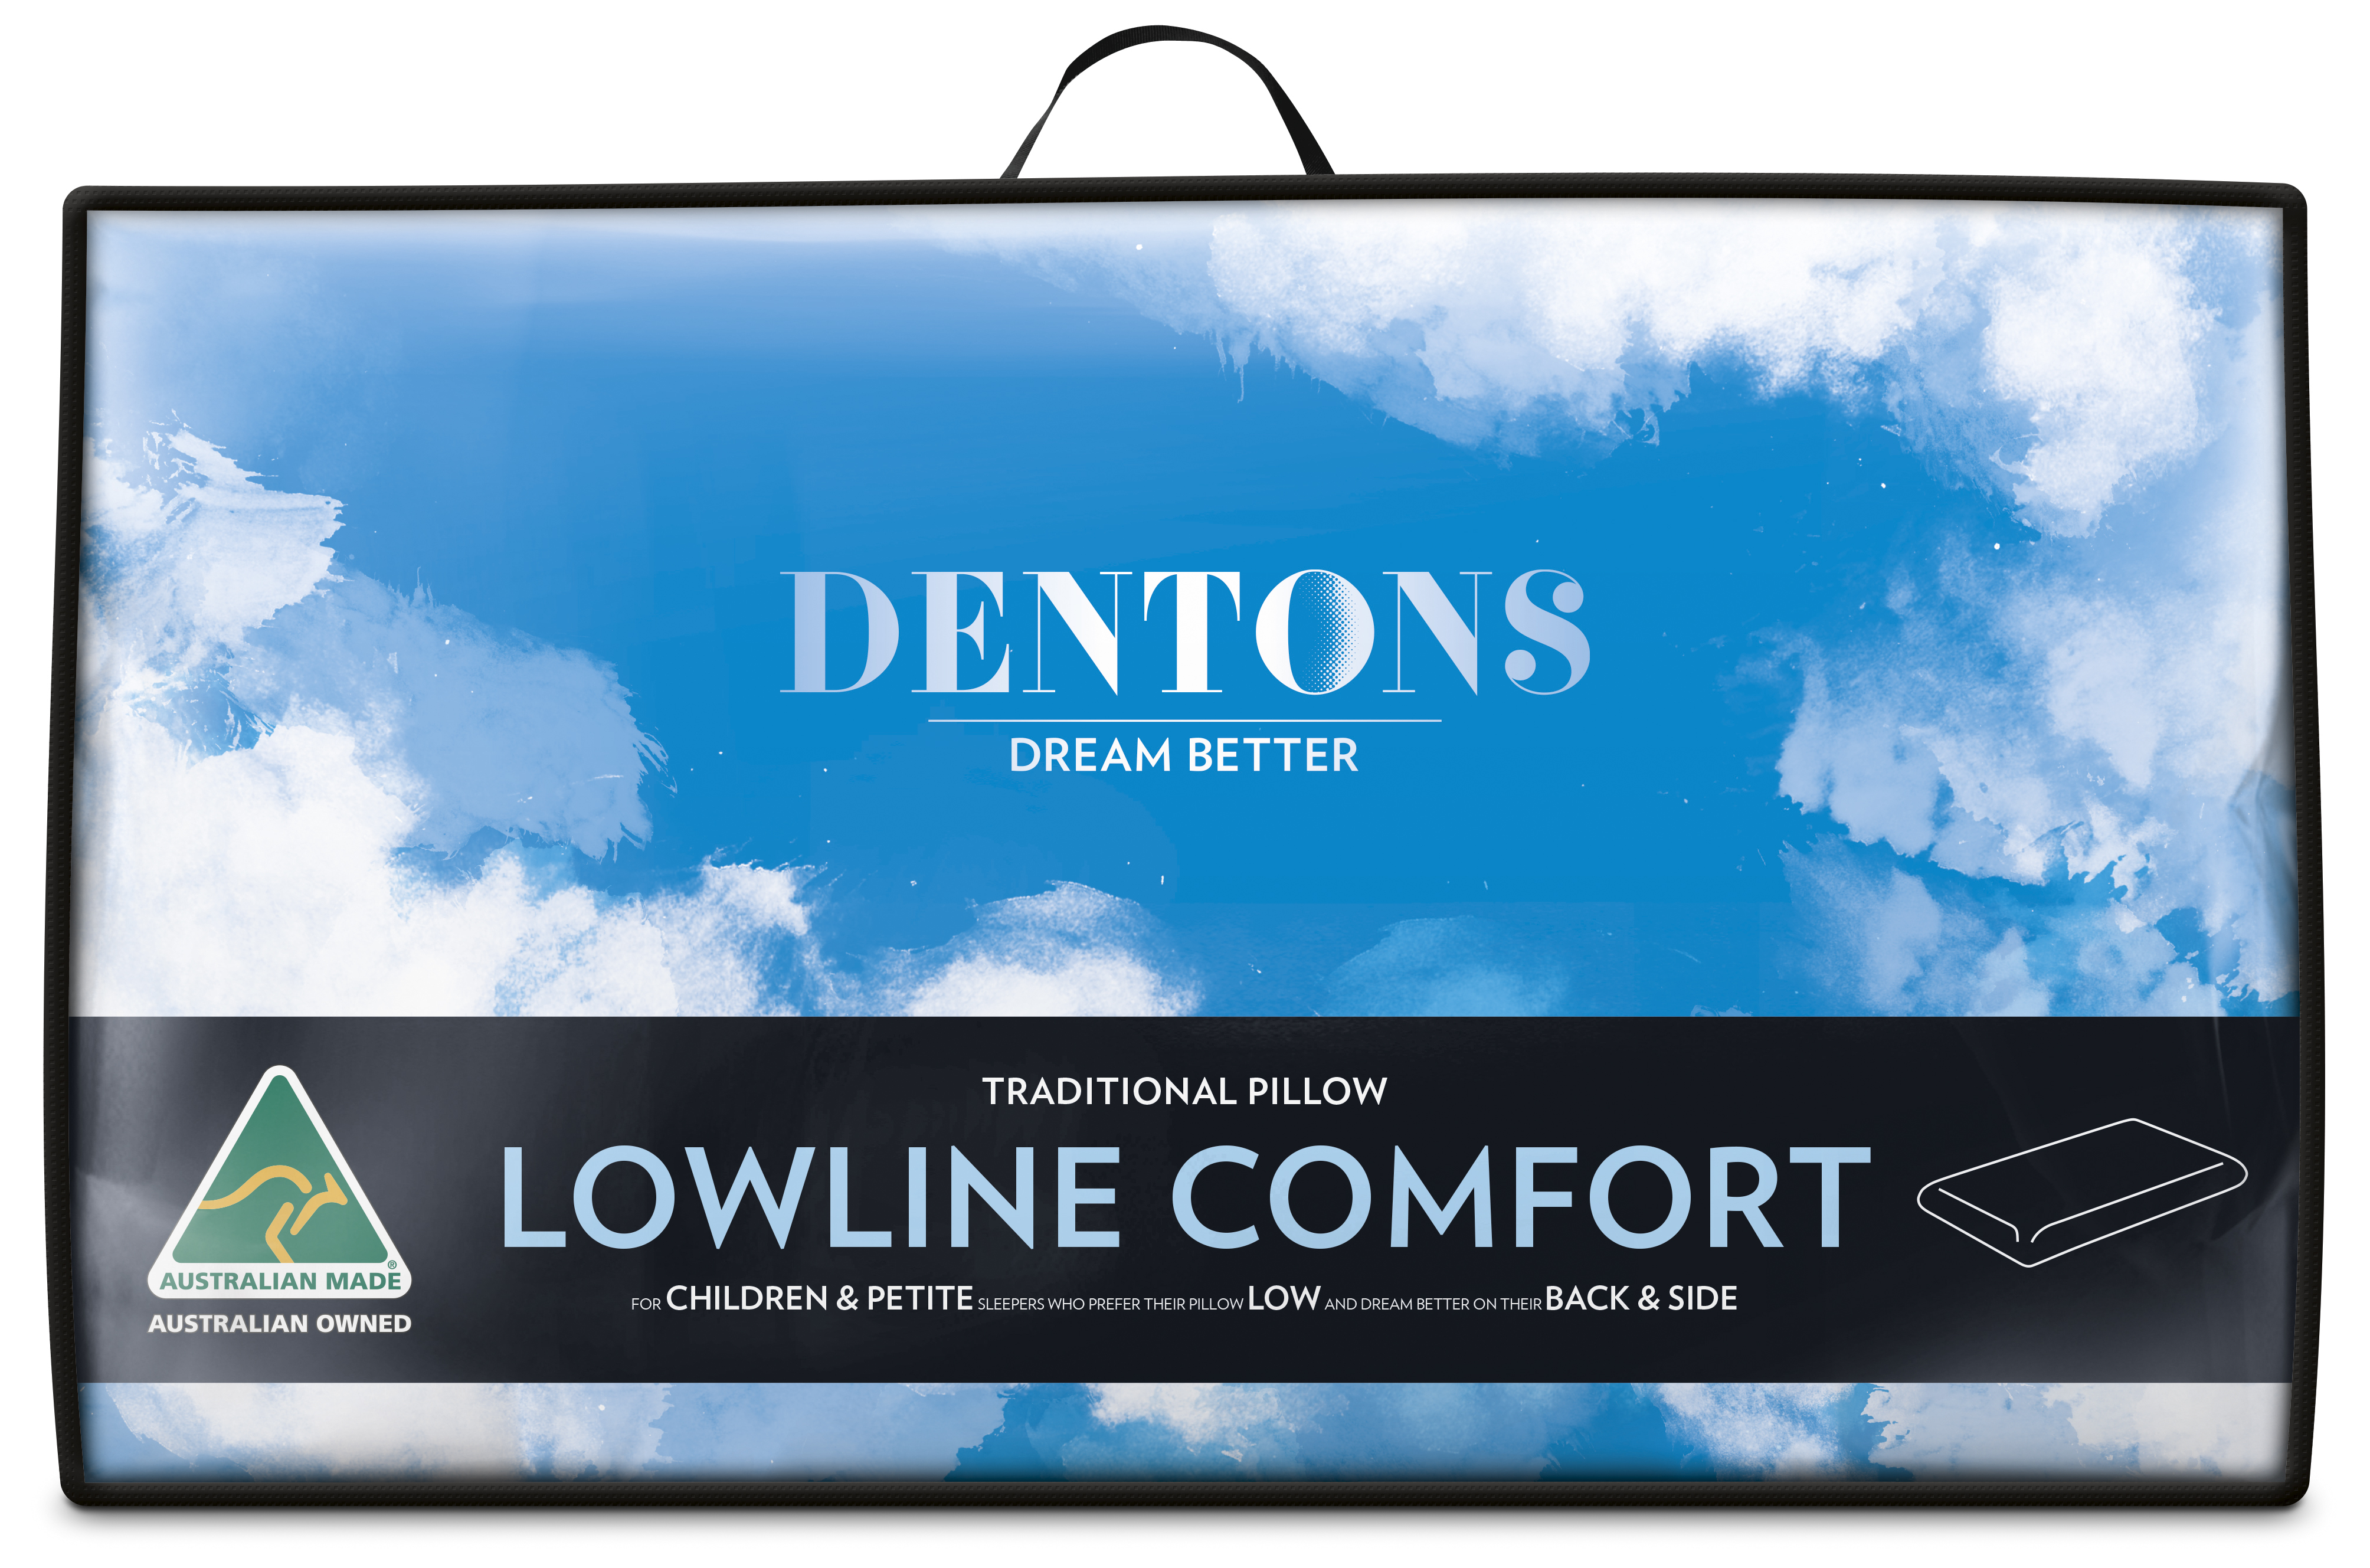 Dentons – Traditional Lowline Comfort Pillow